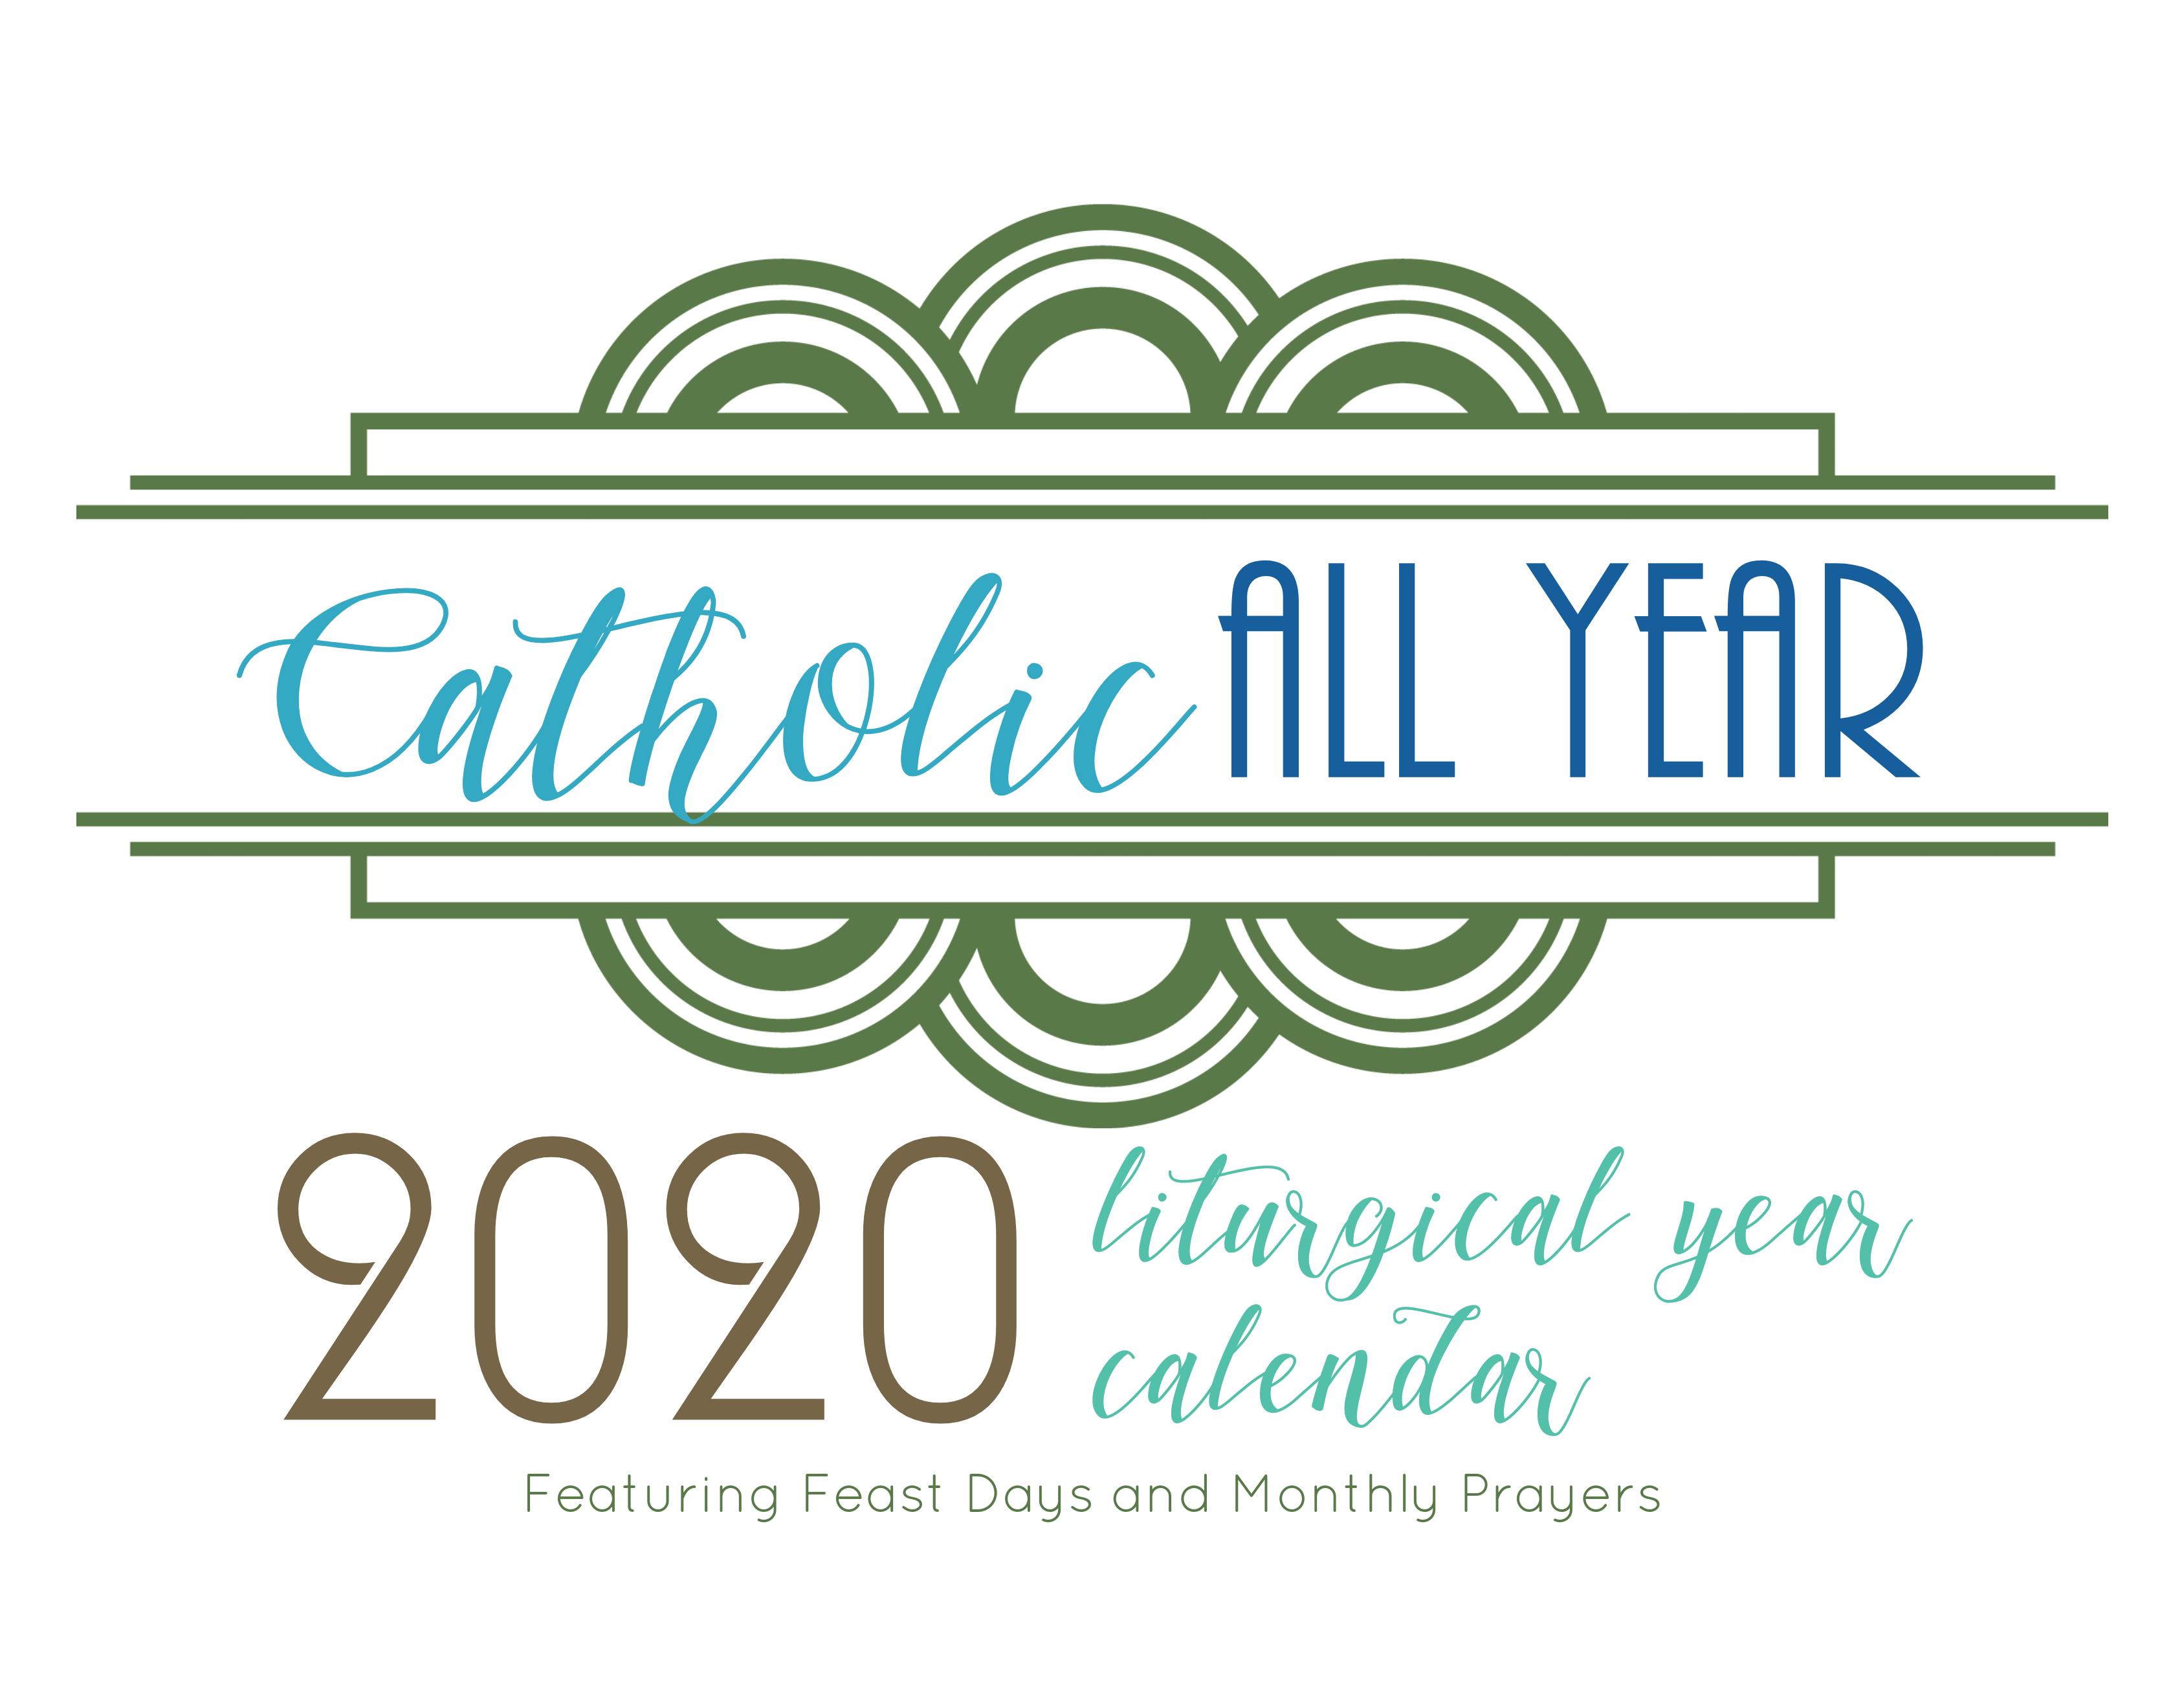 Catholic All Year 2020 Monthly Prayers Liturgical Year Calendar *digital  Download* within 2020 Catholic Liturgical Calendar Pdf